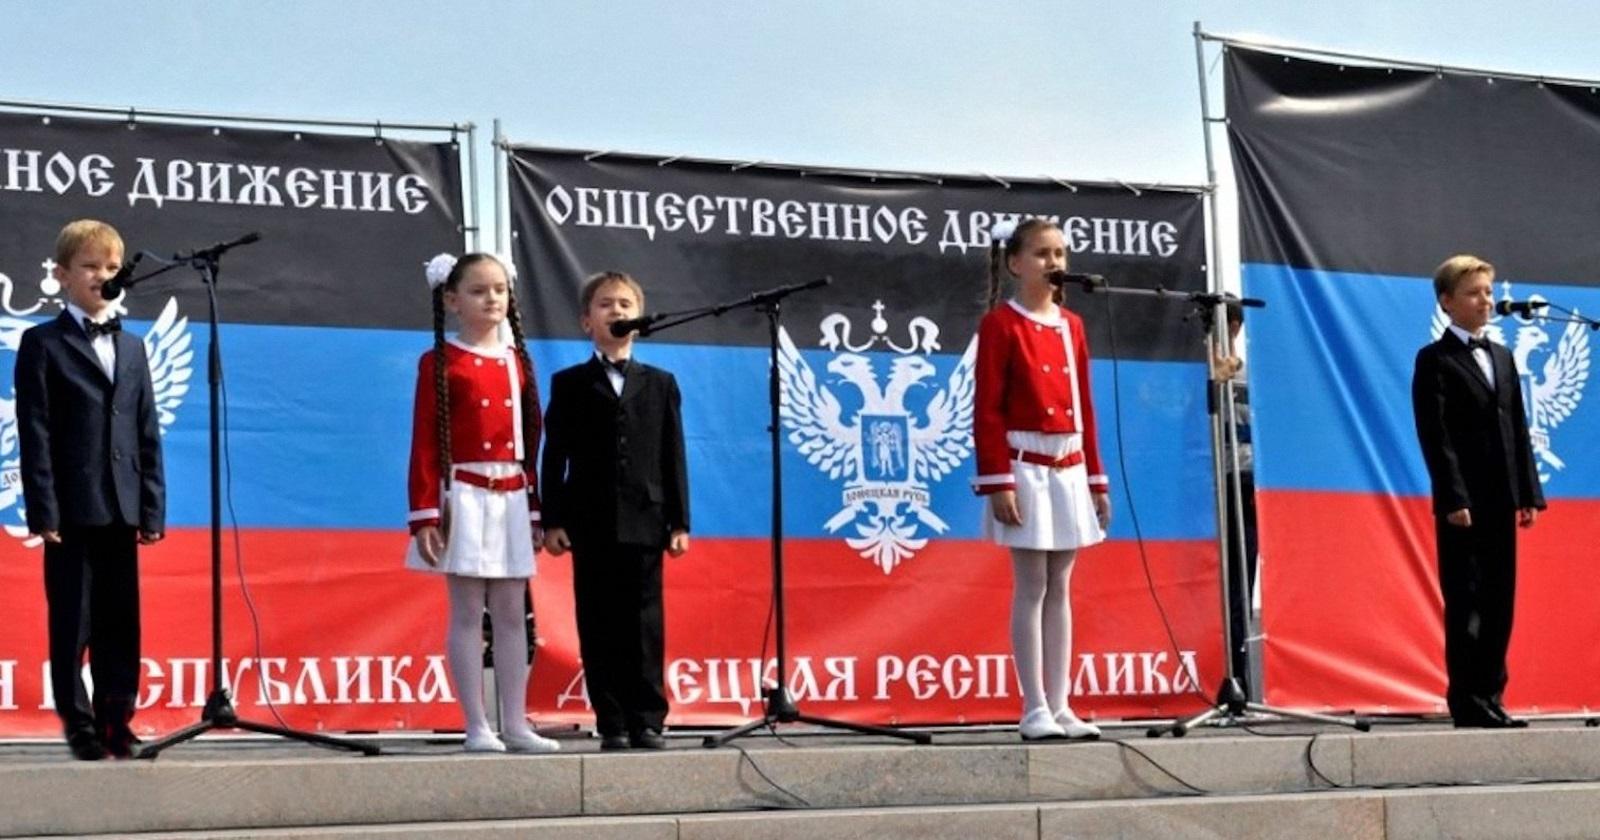 00 dnr donetsk peoples republic kids peace 01 220915